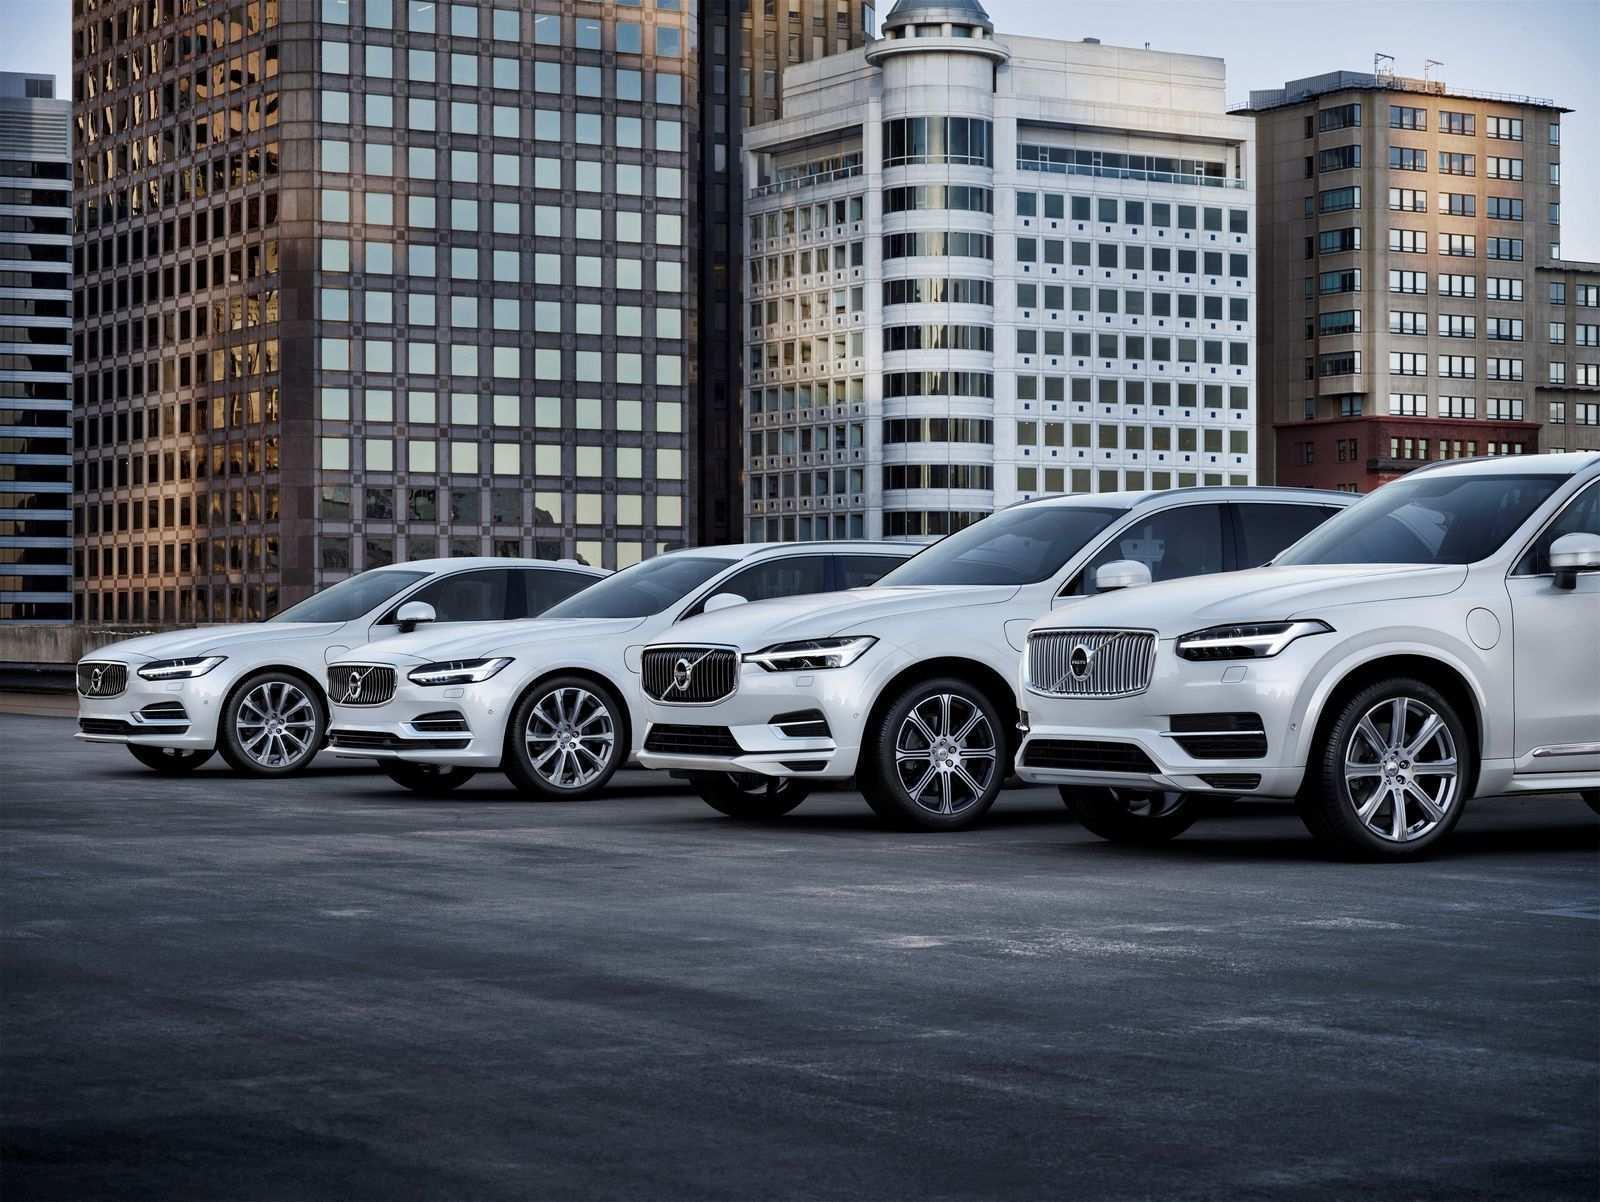 57 All New Volvo 2019 Elektrikli Redesign and Concept for Volvo 2019 Elektrikli